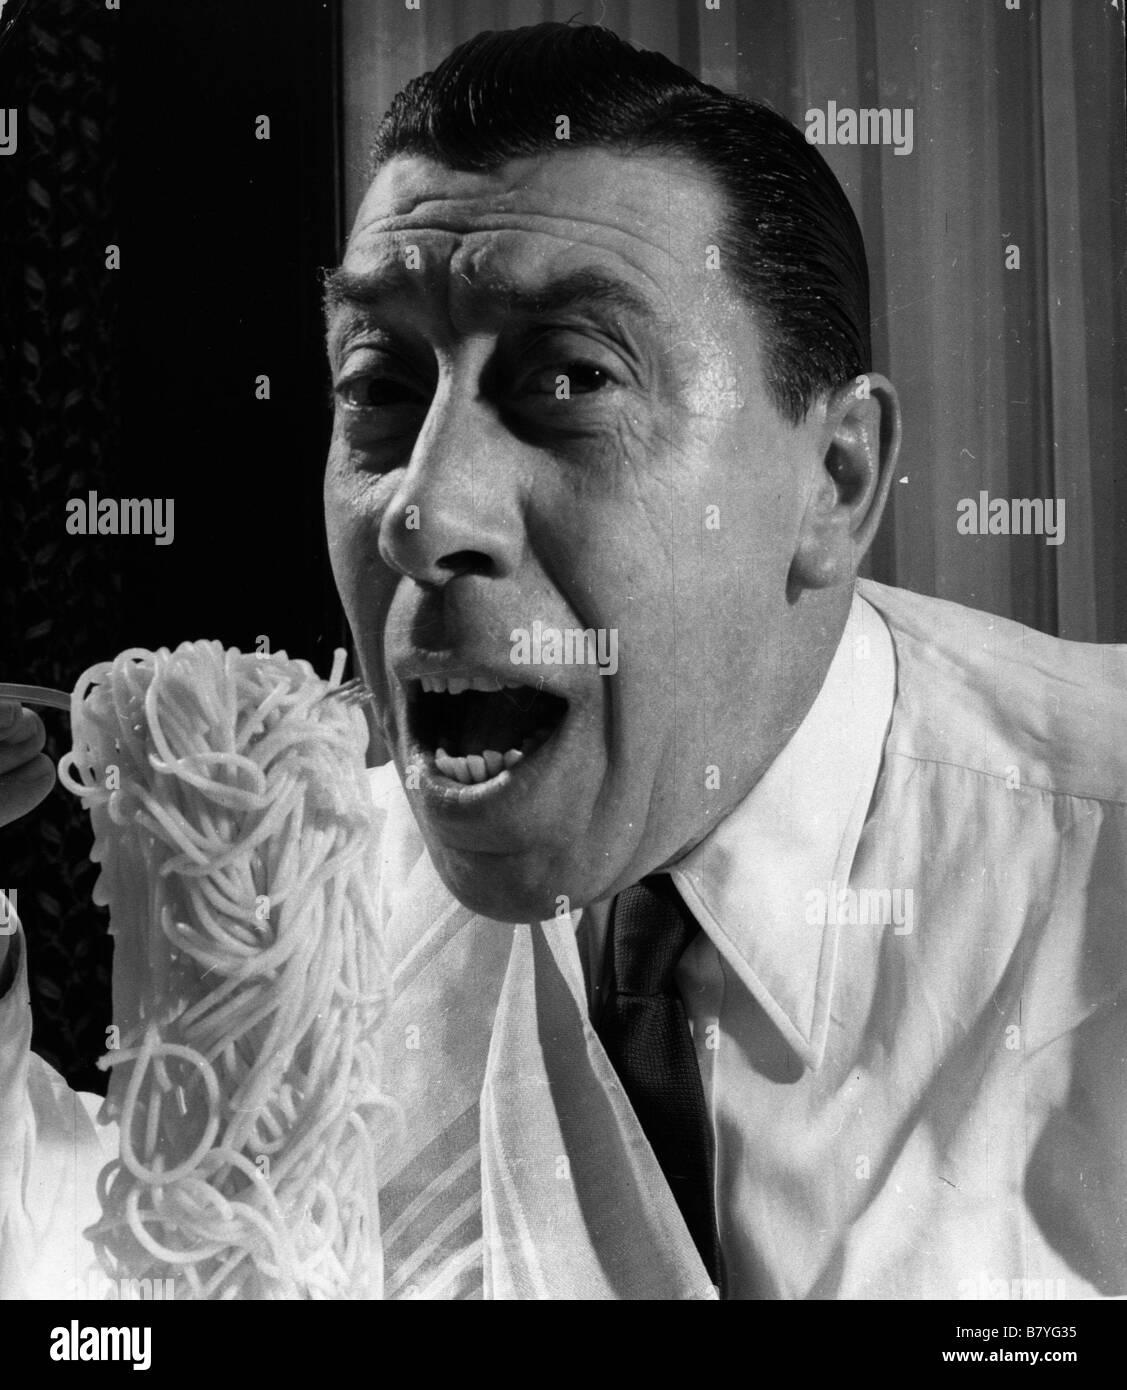 fernandel discographiefernandel film, fernandel biographie, фернандель фильмы, fernandel francais, fernandel wikipedia fr, fernandel mp3, fernandel - l'accent, fernandel streaming gratuit, fernandel félicie aussi paroles, fernandel filmography, fernandel félicie aussi, fernandel zizi, fernandel foto, fernandel movies list, fernandel félicie, fernandel interview 1970, fernandel on dit qu'il en est, fernandel l acrobate, fernandel discographie, fernandel filmographie